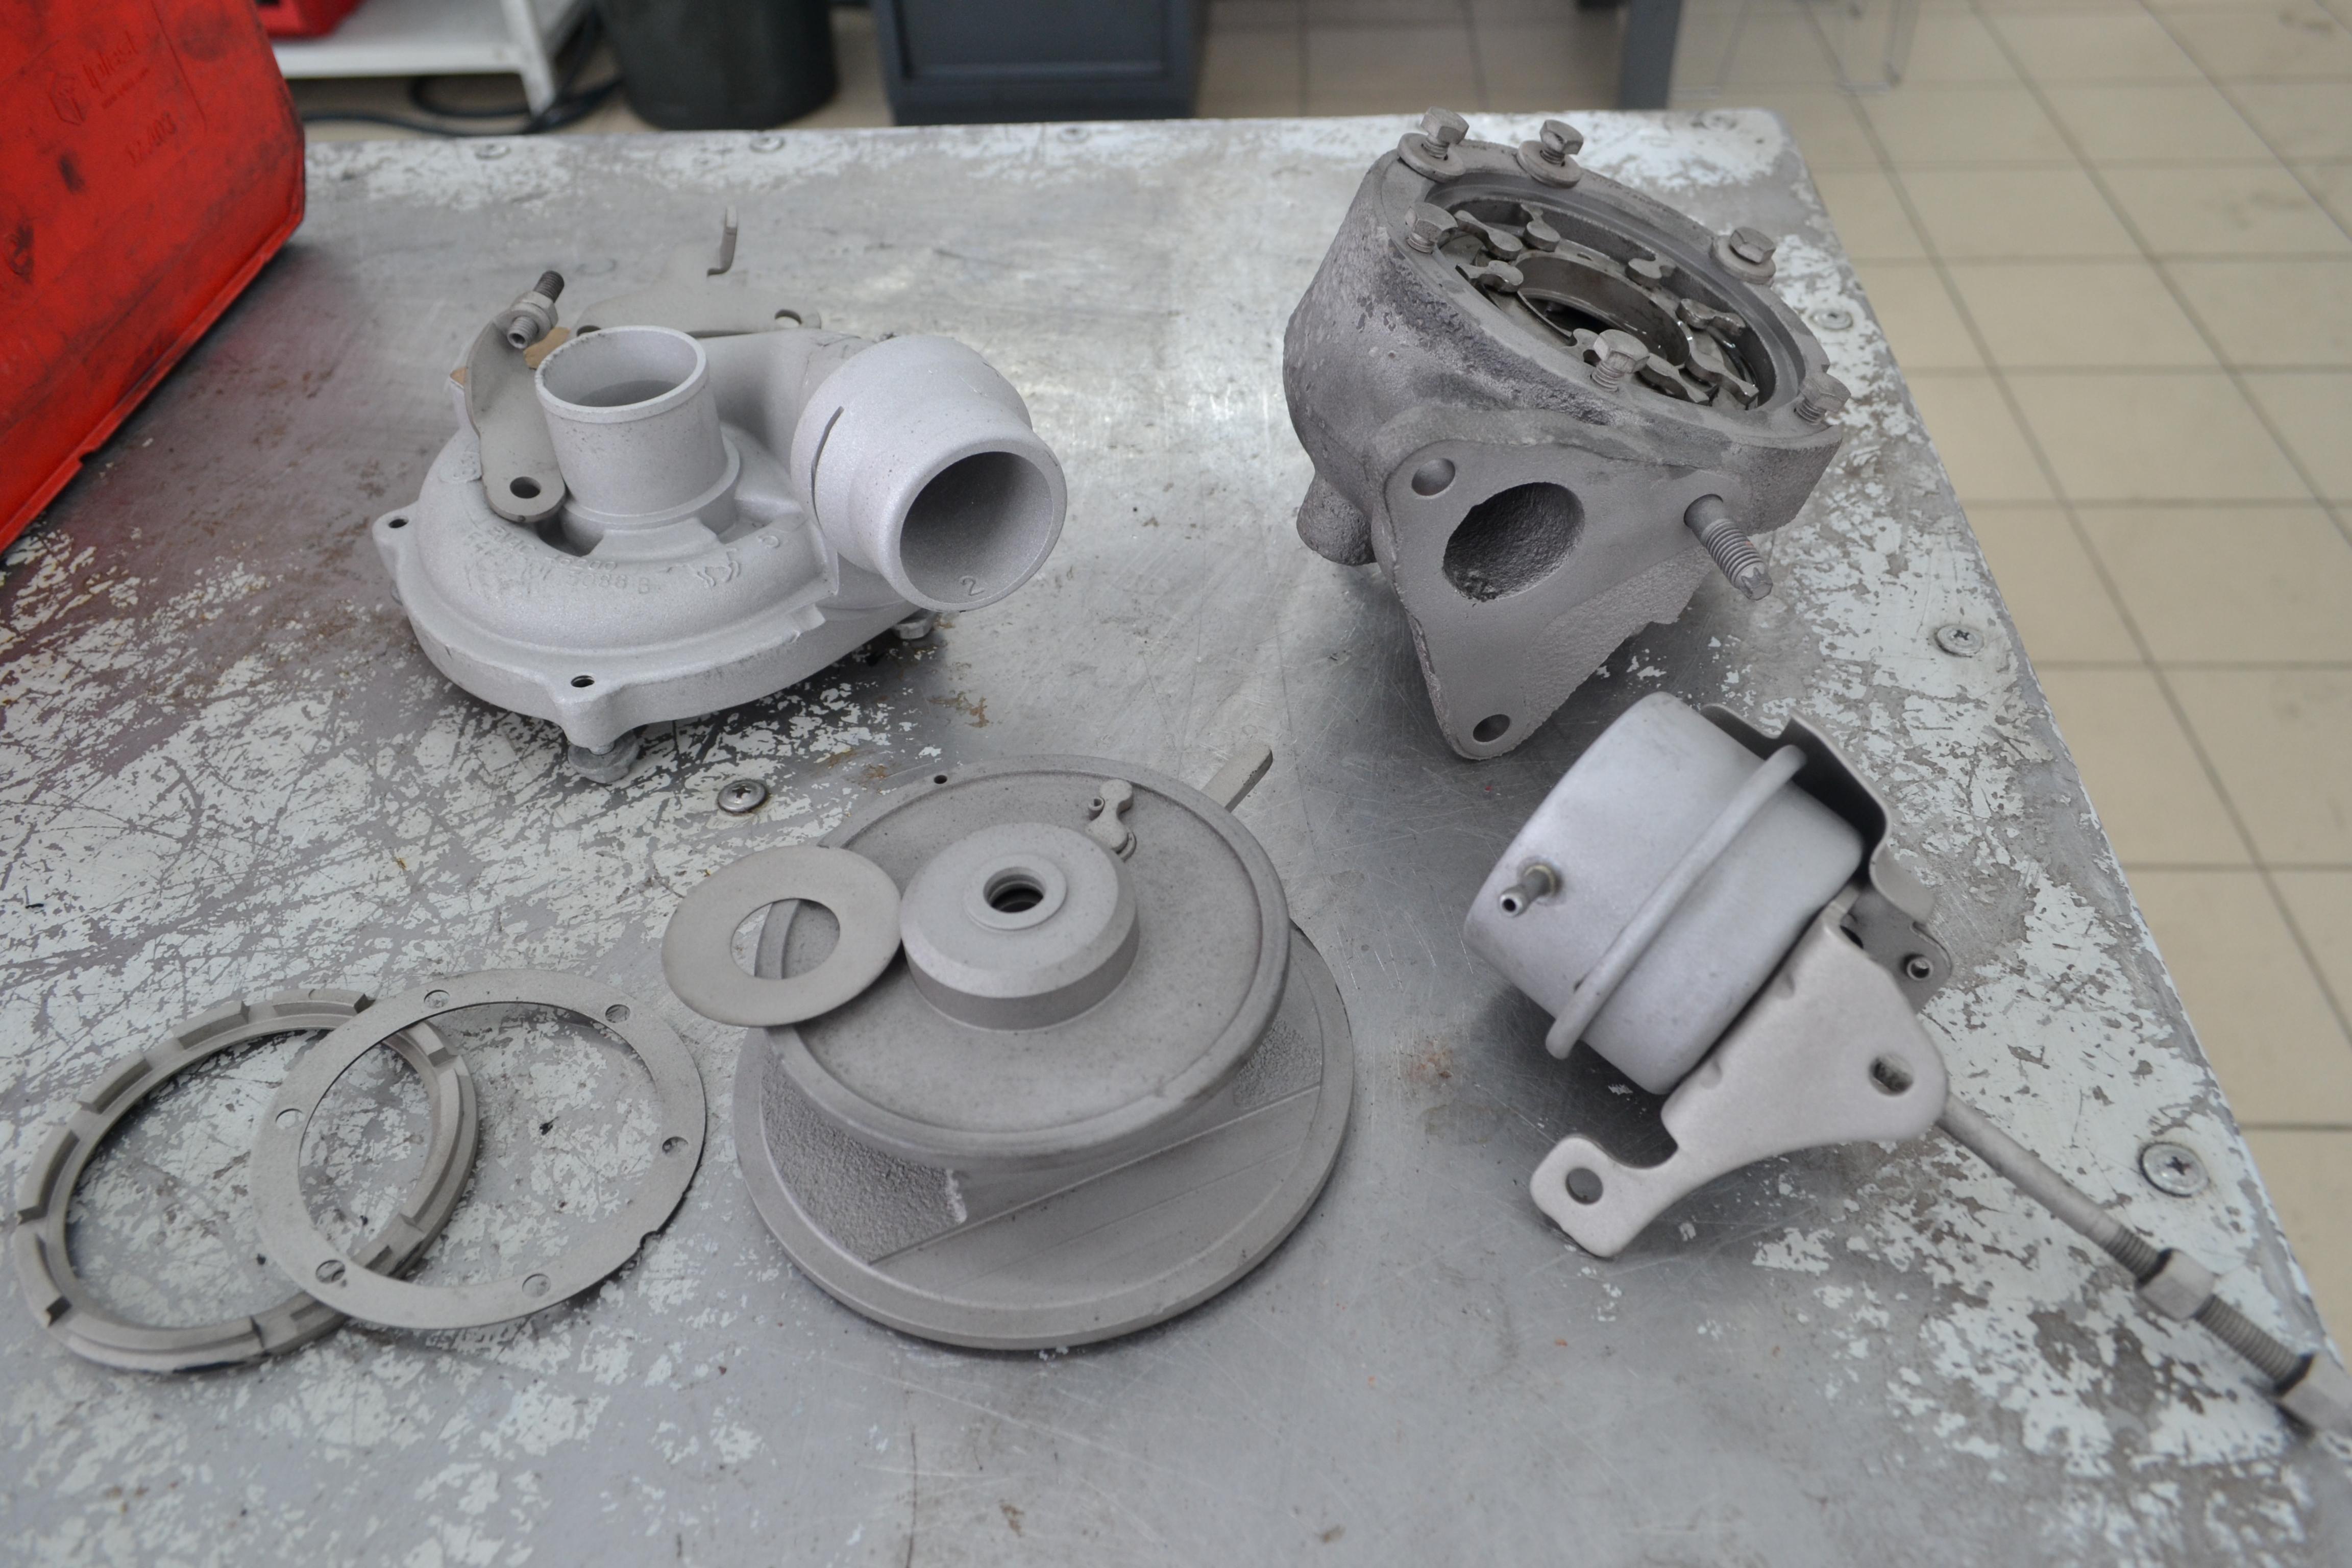 Renault Scenic, сценик, ремонт турбины, 5439-970-0070